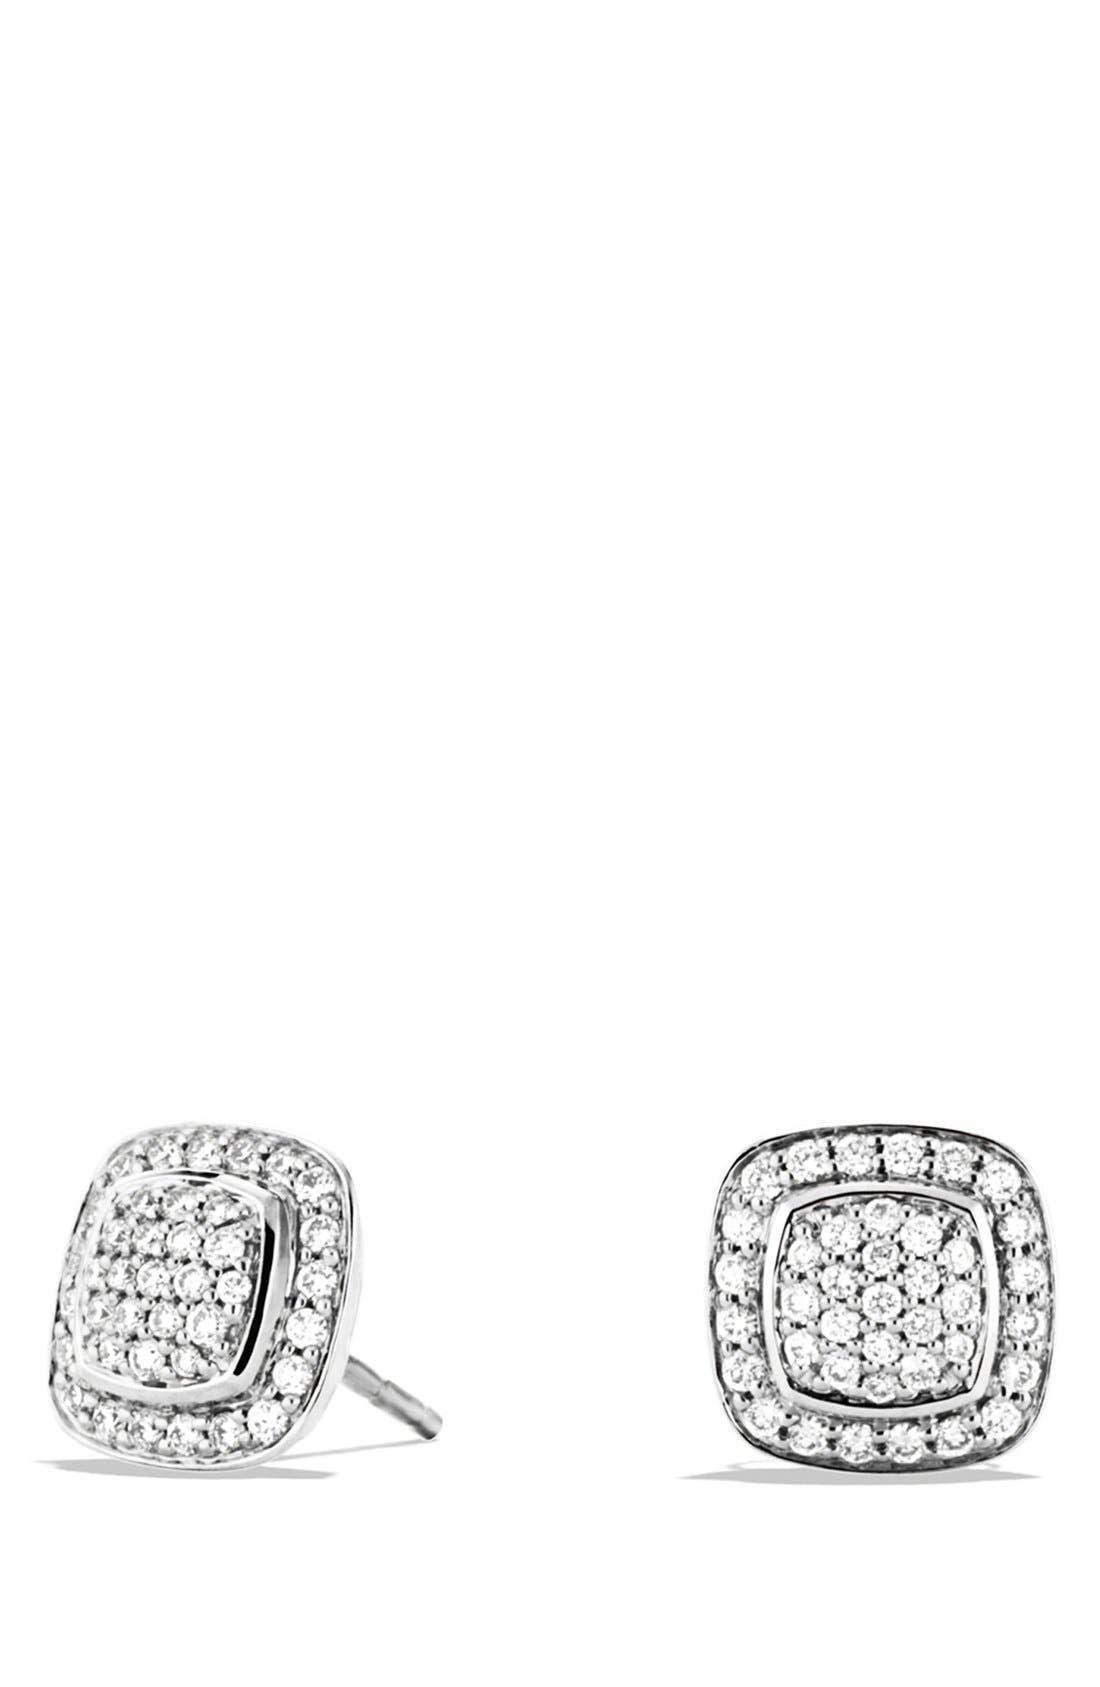 DAVID YURMAN Albion Earrings with Diamonds